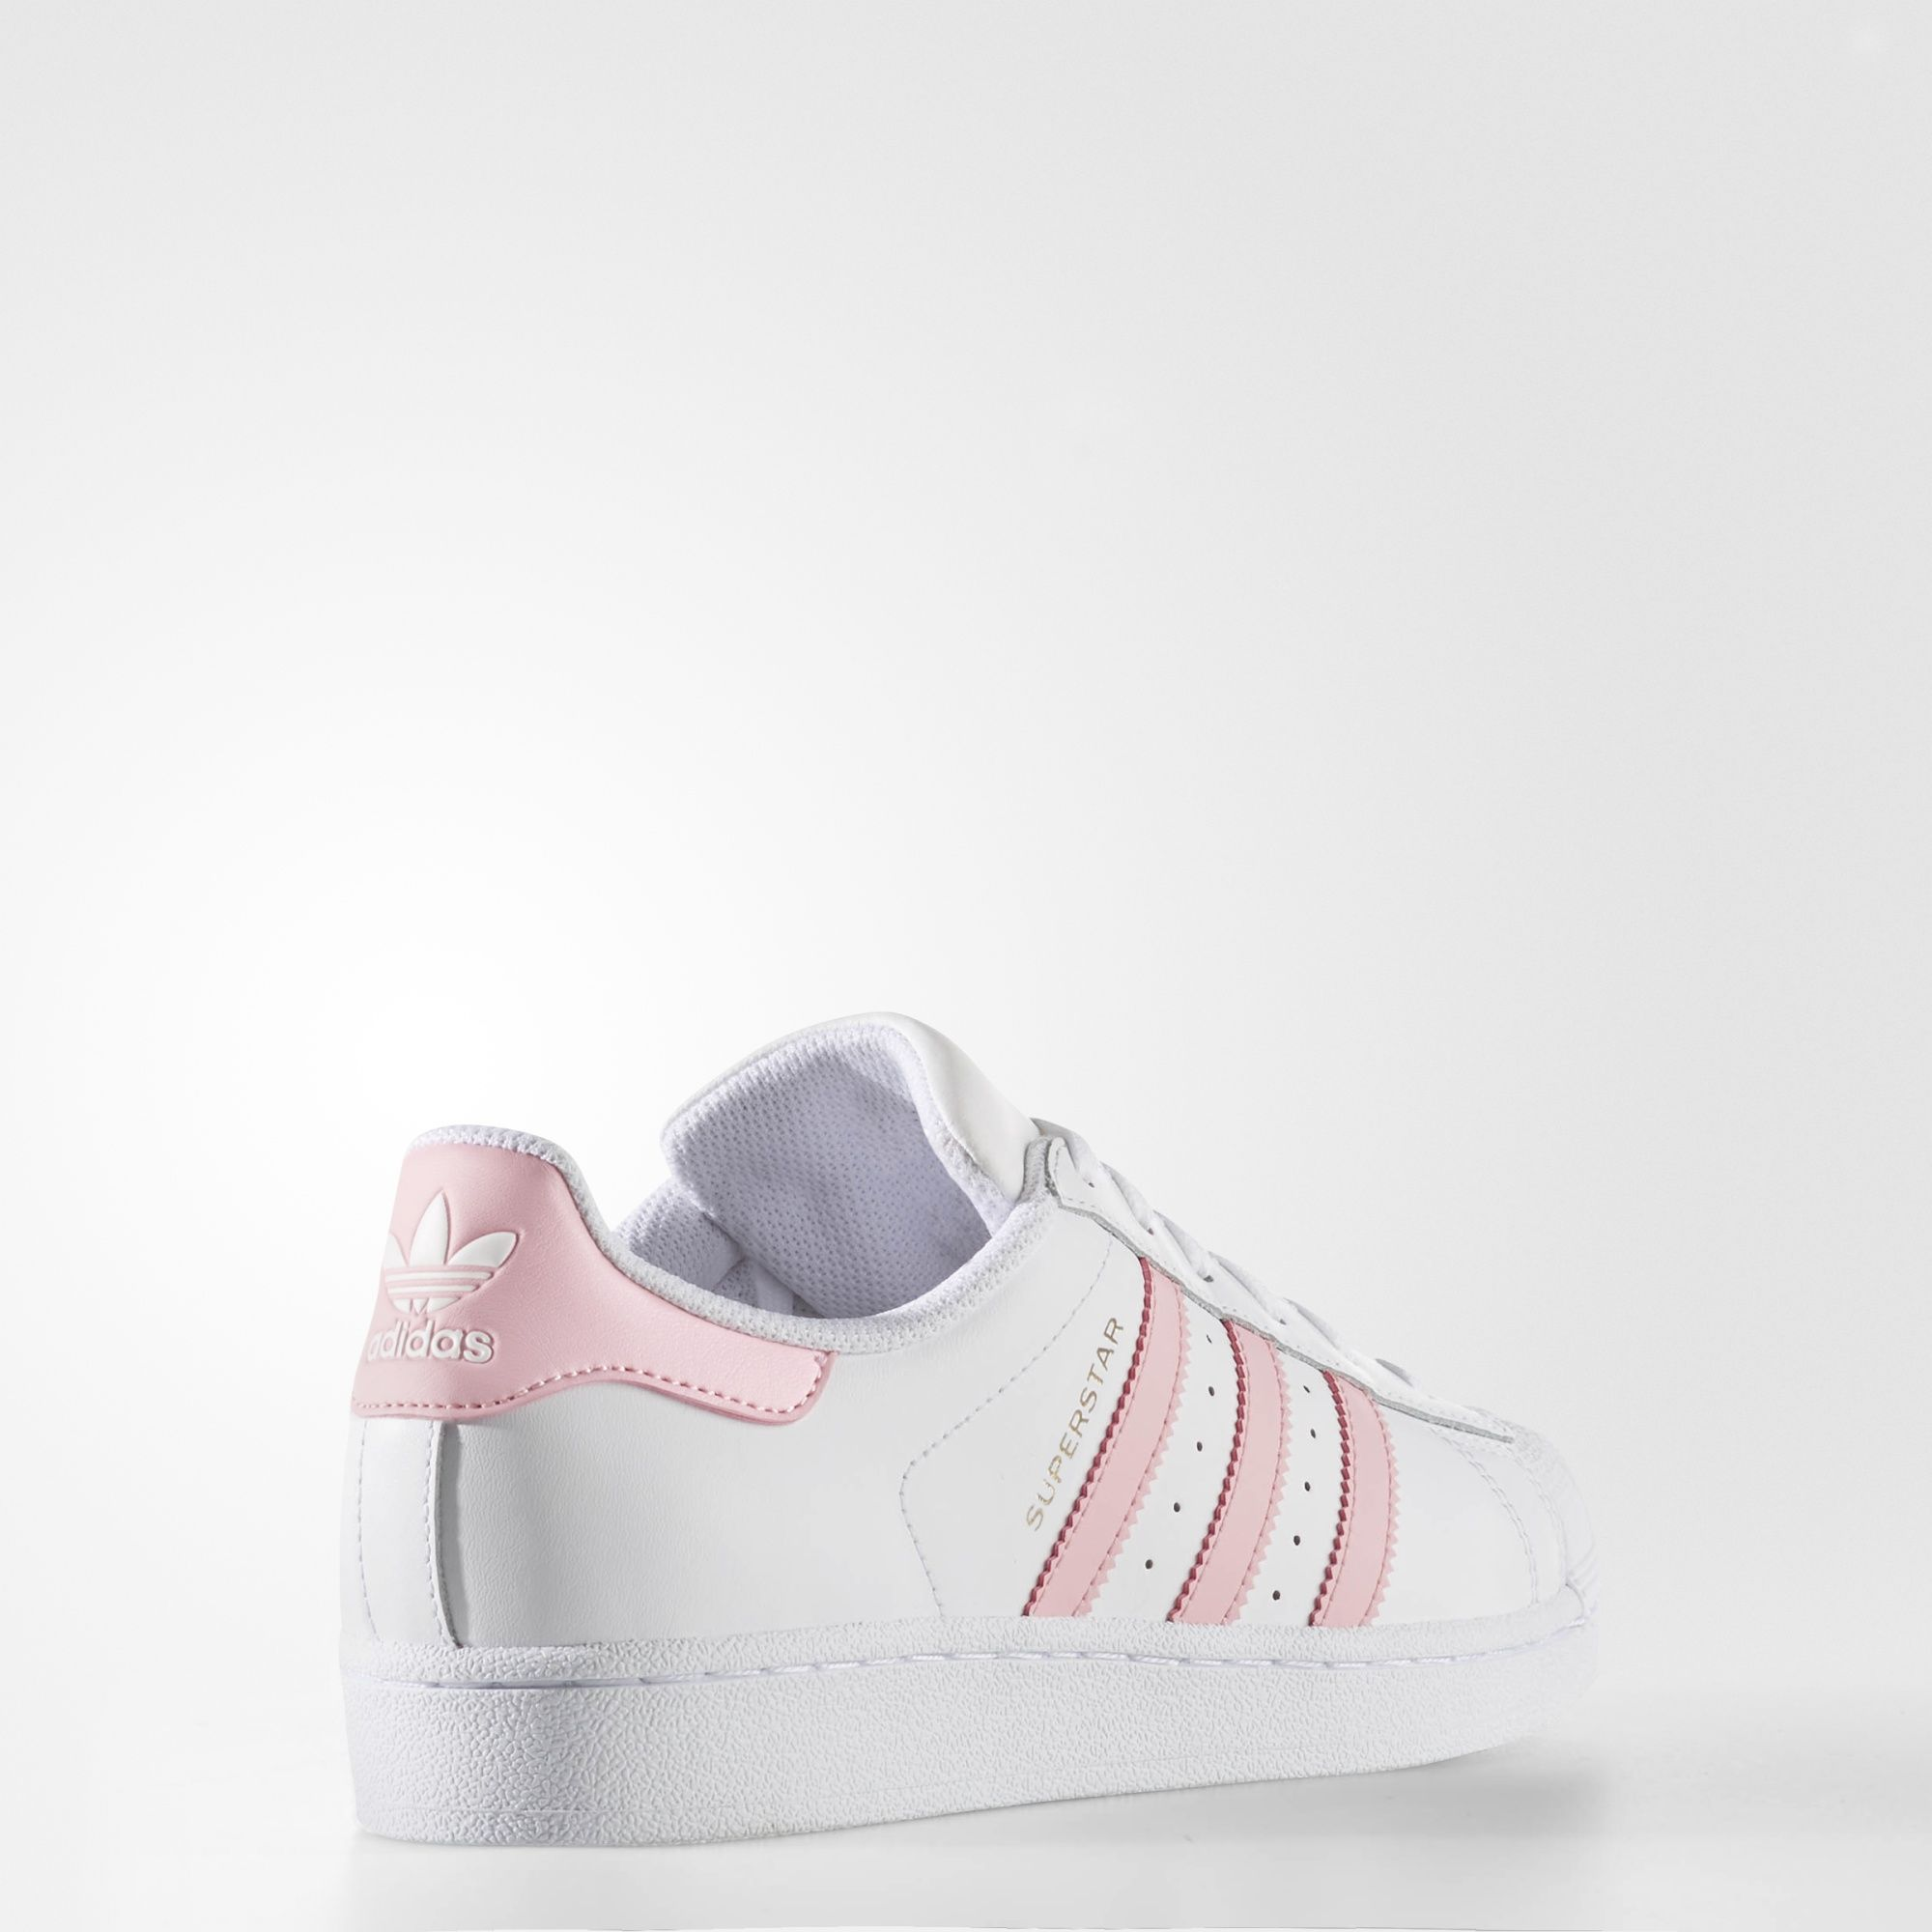 adidas superstar ins rosa sicher financial services ltd.